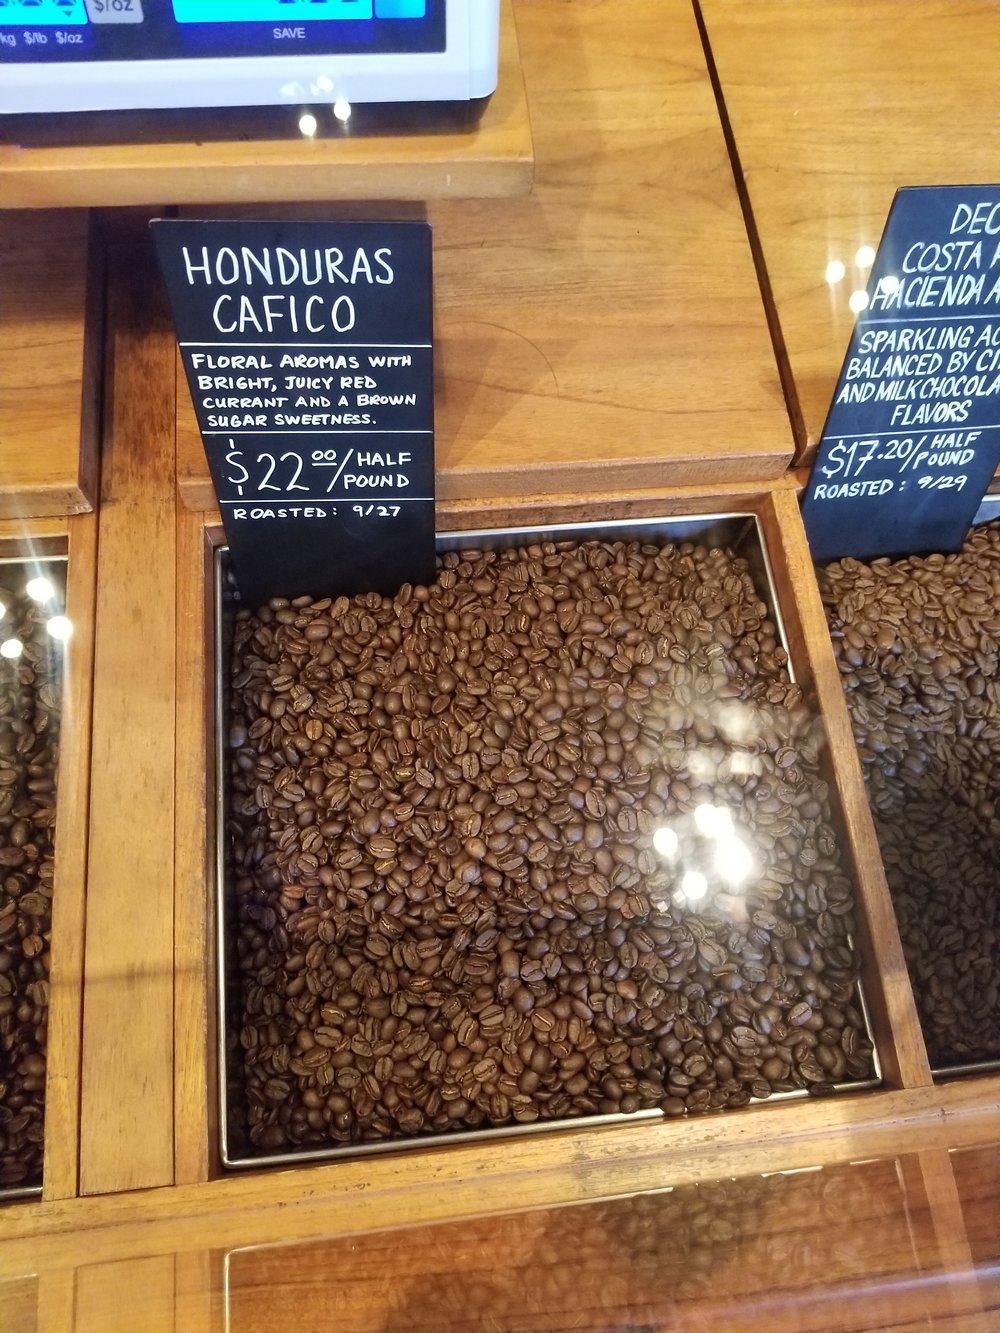 9.29.18 Honduras Cafico on scoop bar at the Seattle Roastery.jpg